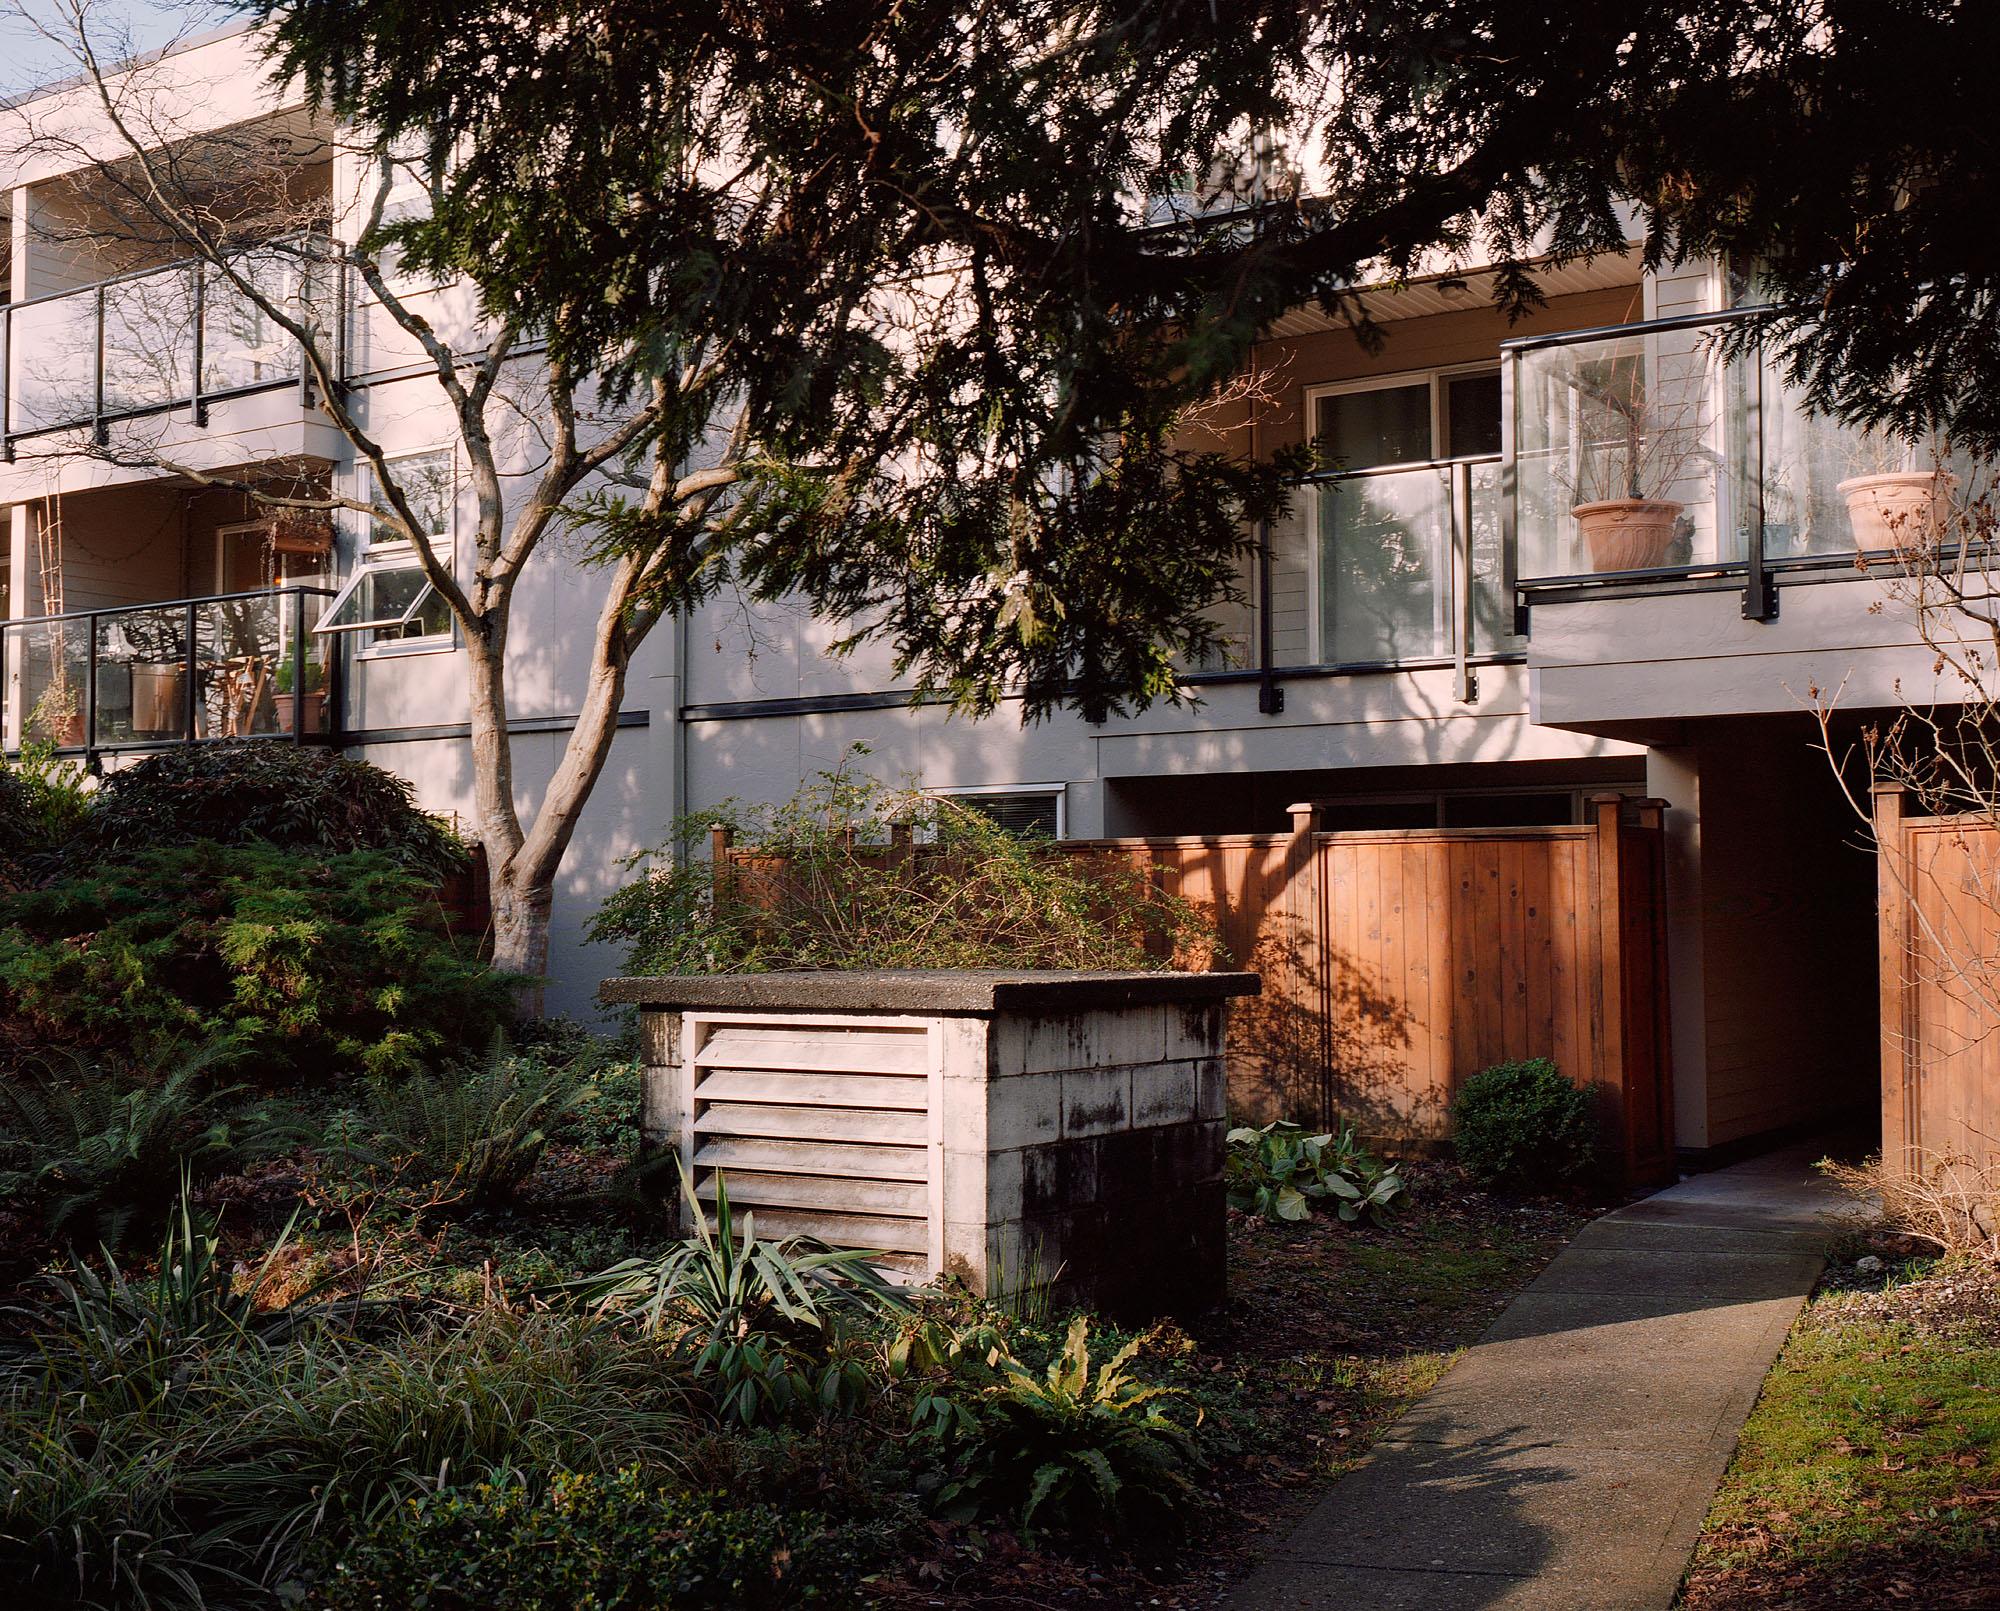 Vancouver_Mamiya7_Roll06__04.jpg